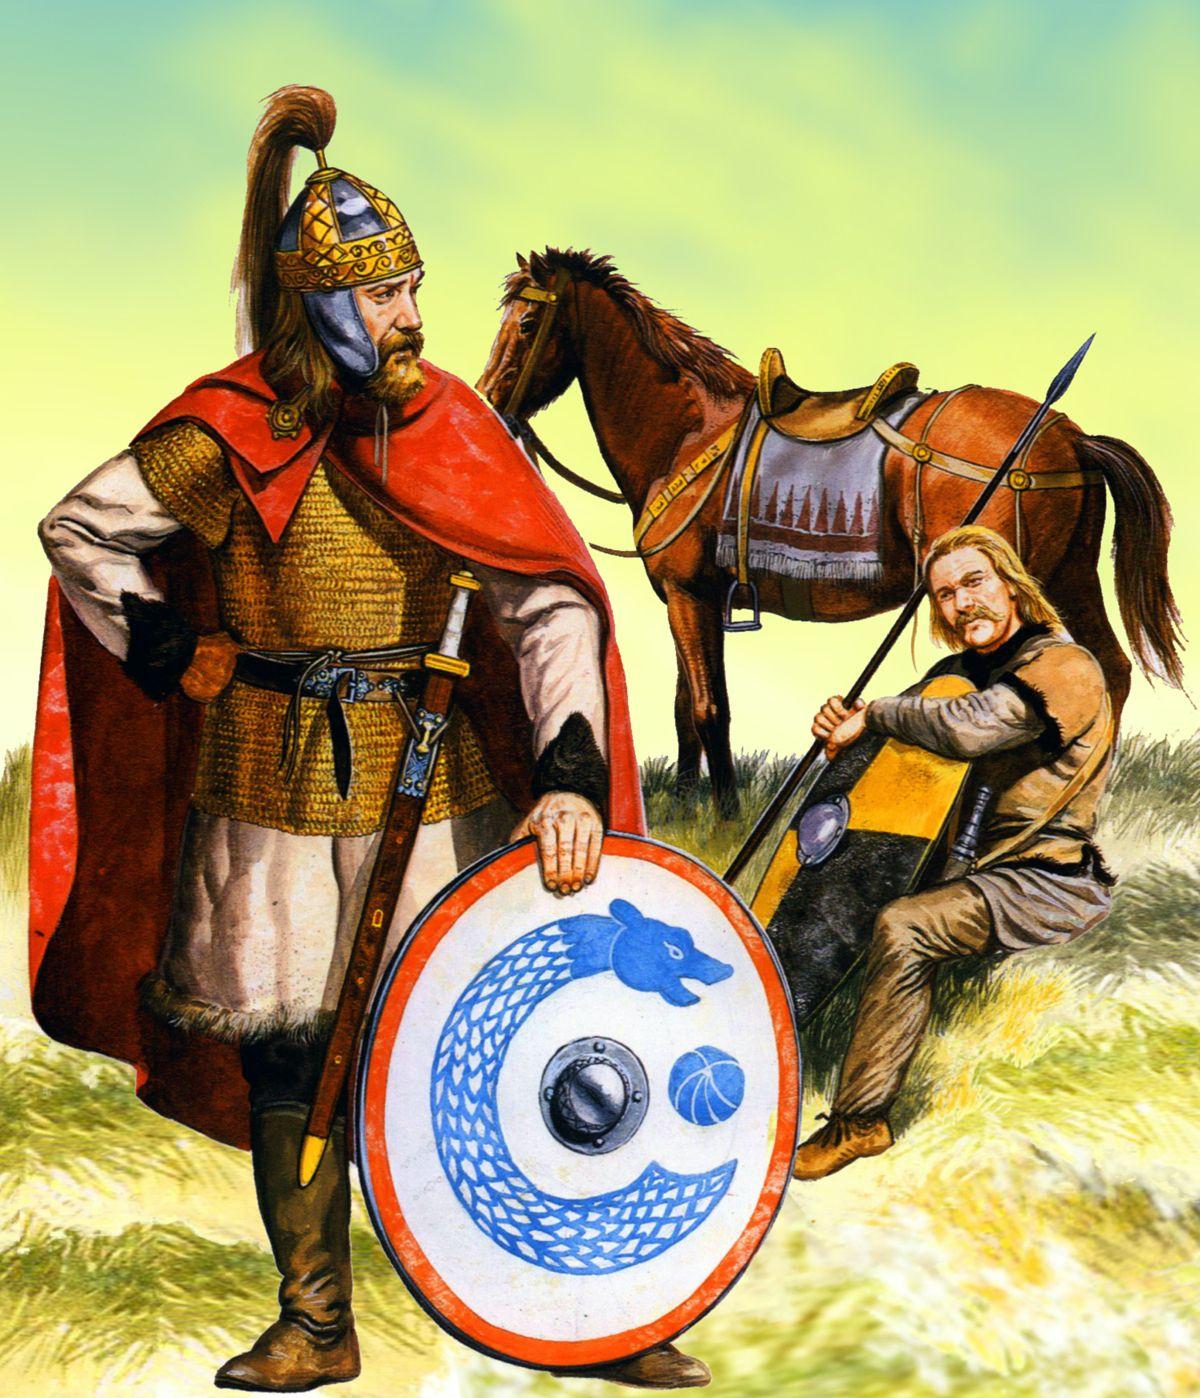 Artistic Representation Of An Almohad Elite Warrior 13th